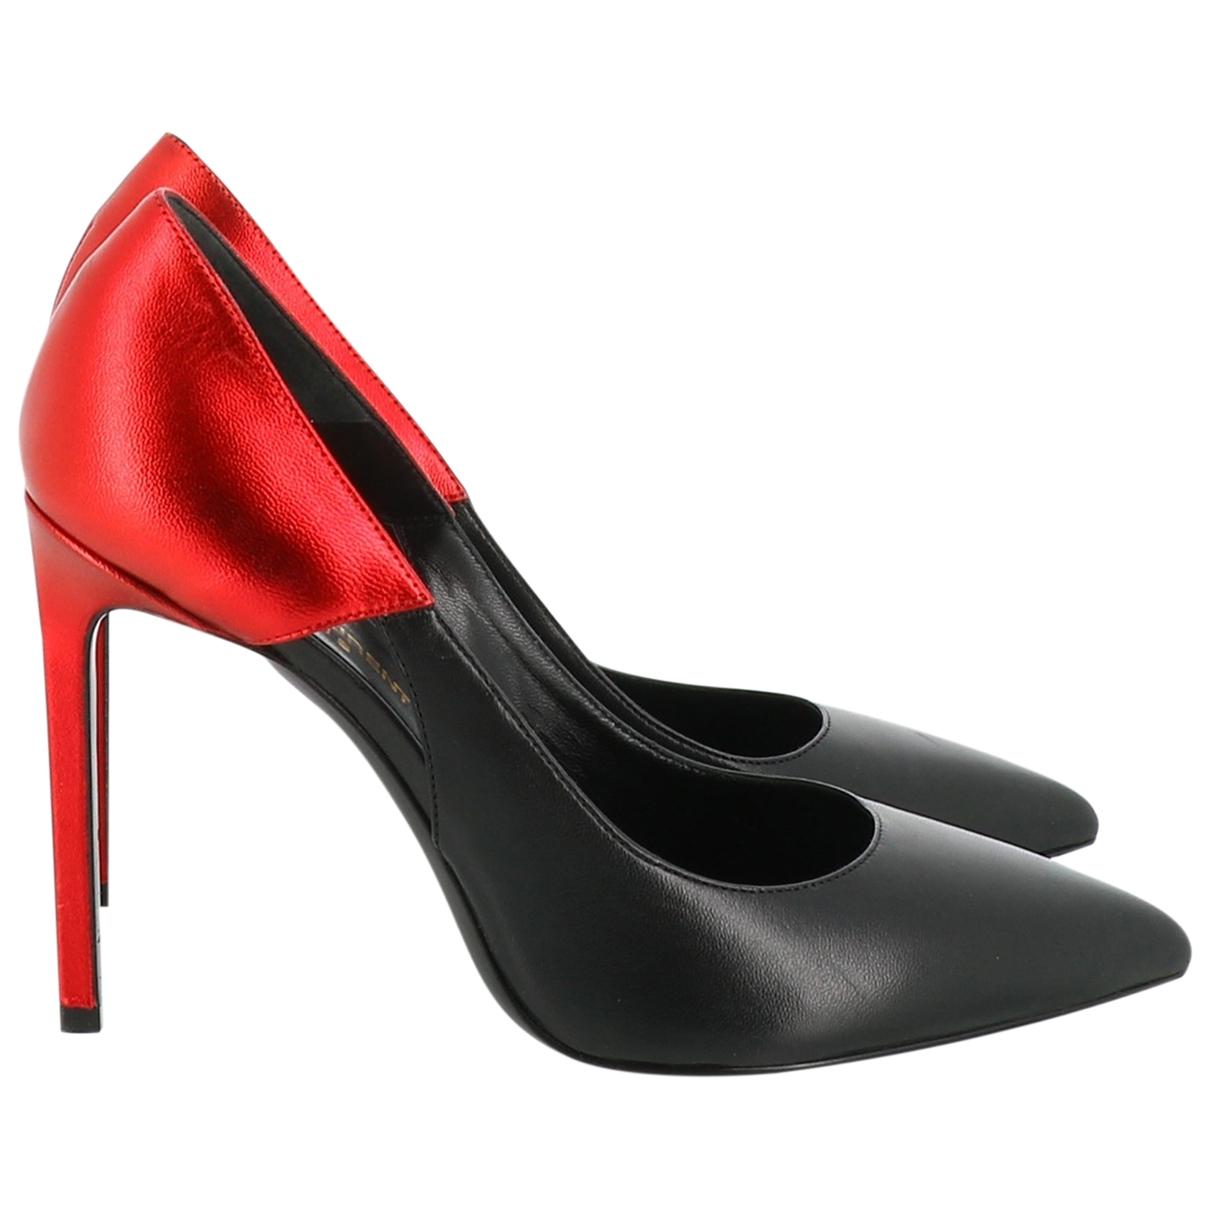 Saint Laurent \N Leather Heels for Women 38.5 EU